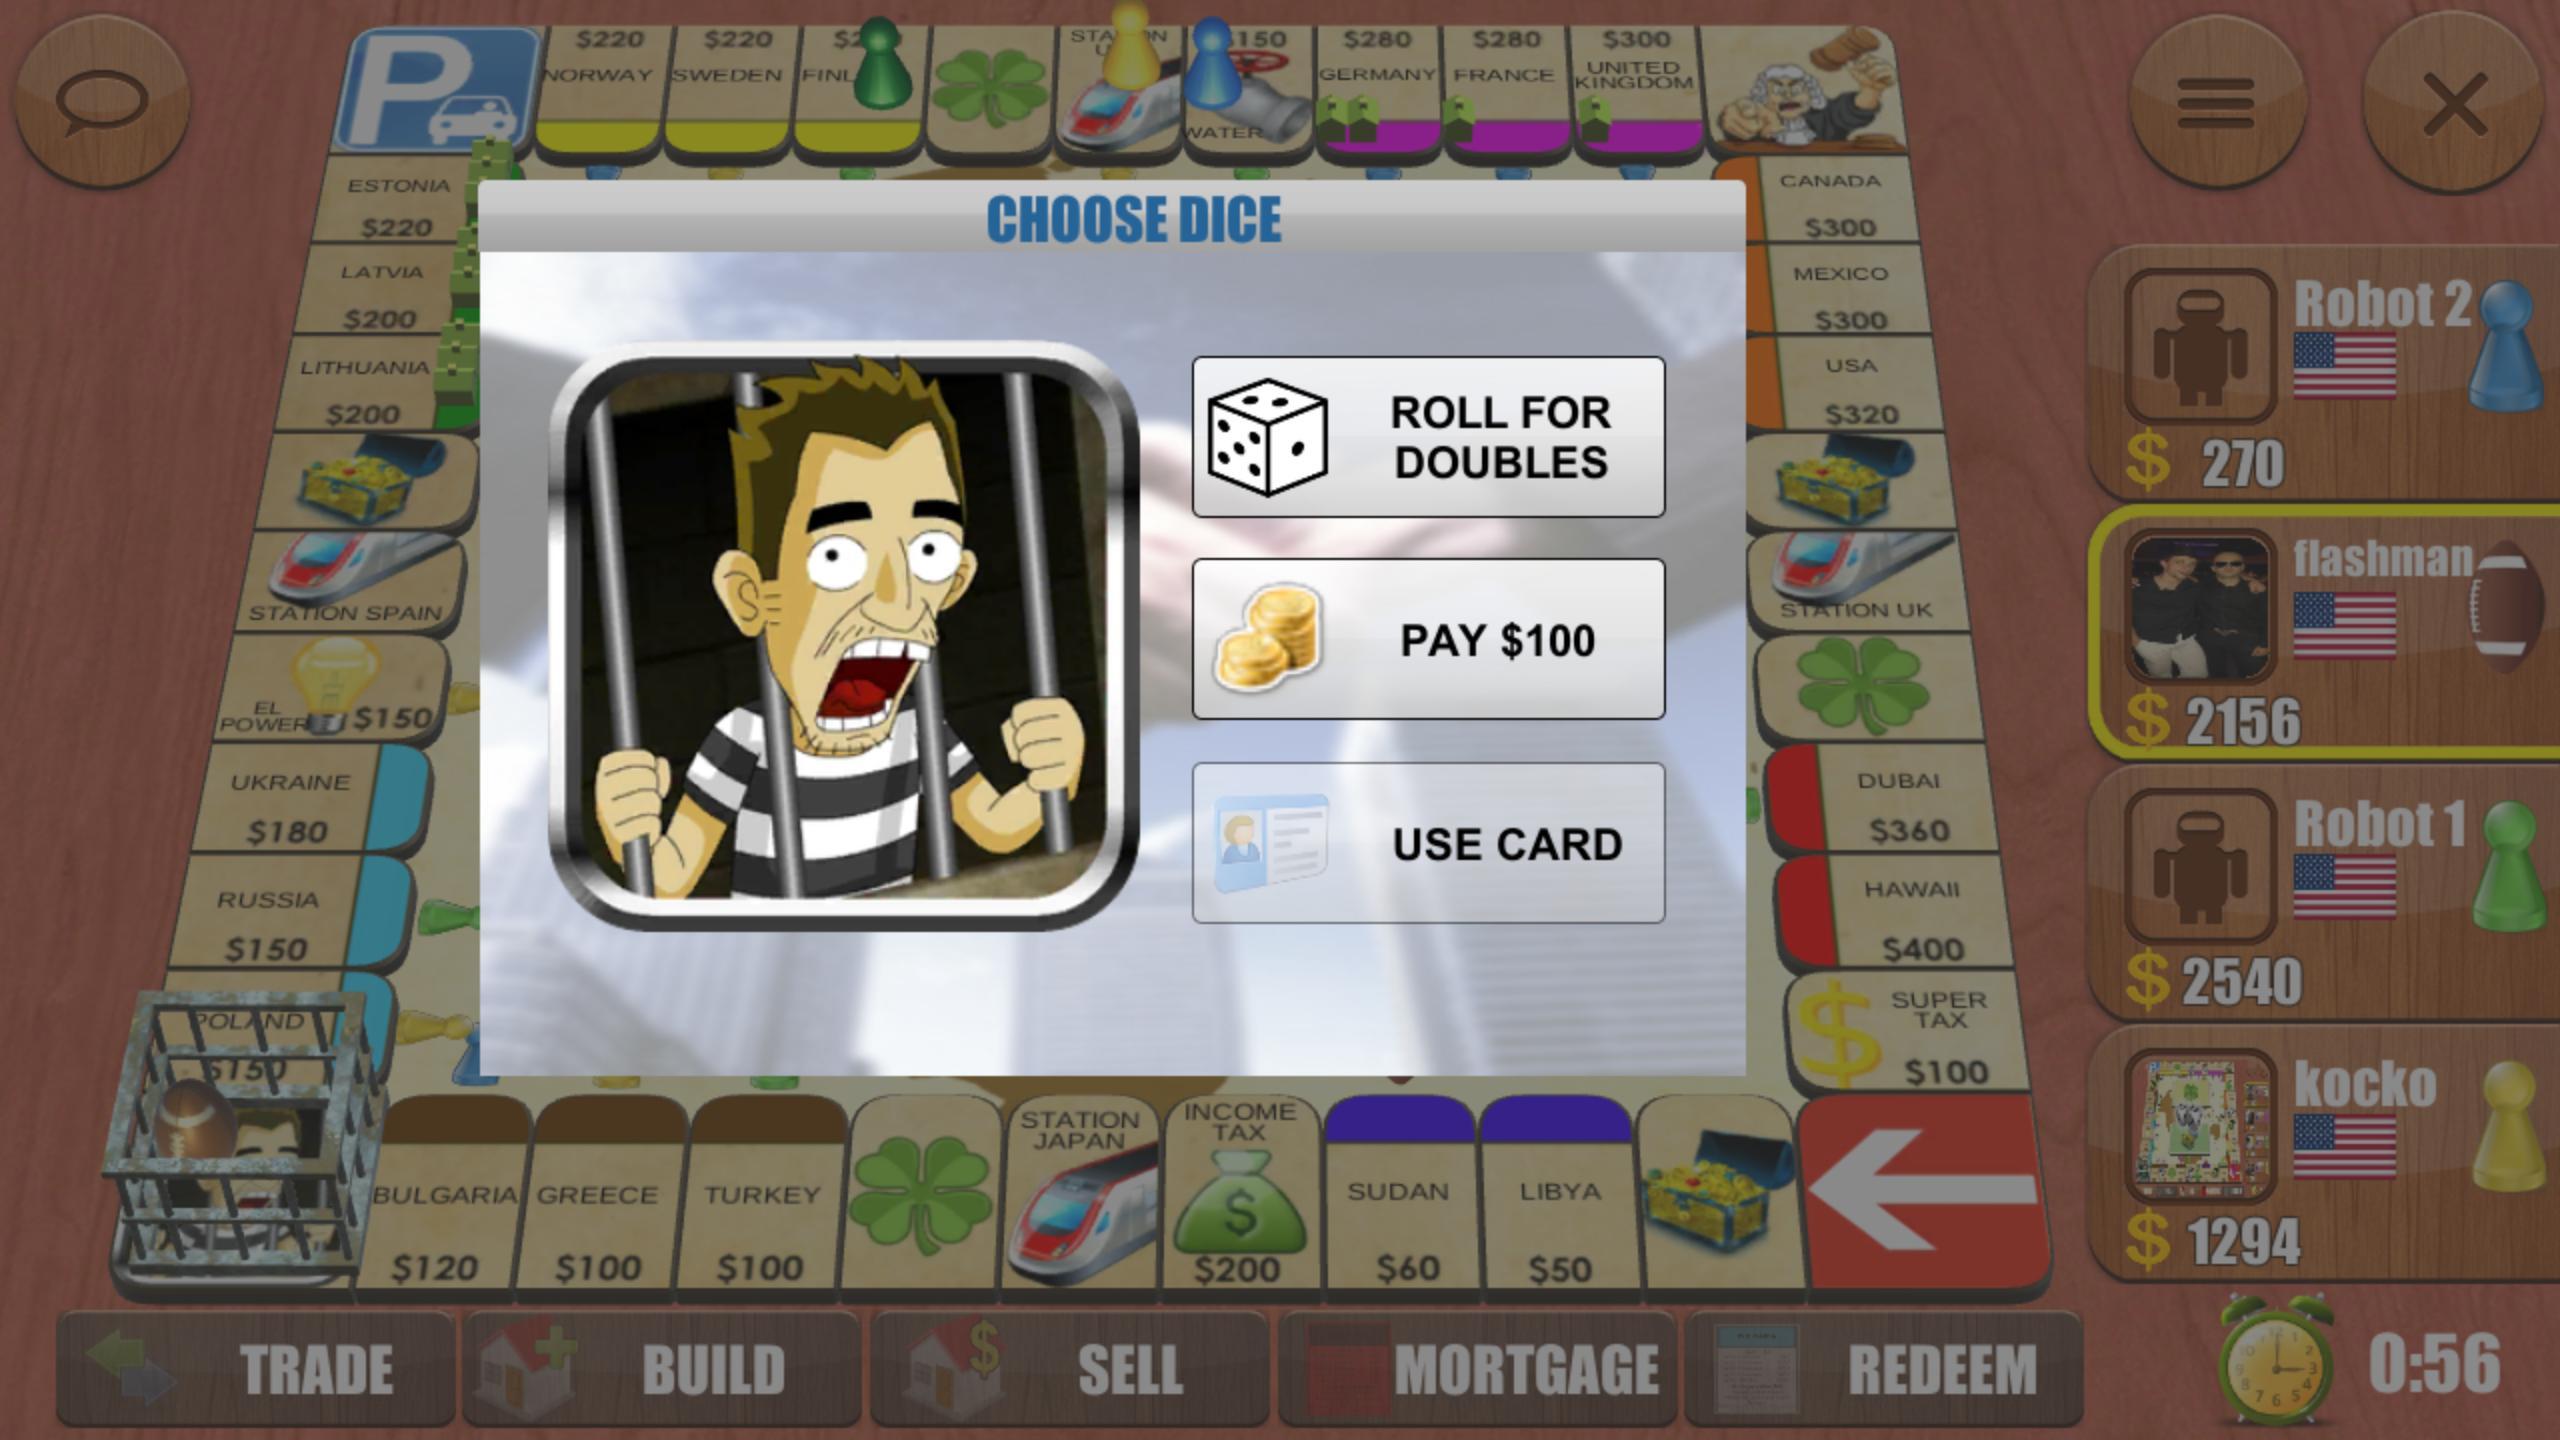 Rento Dice Board Game Online 5.1.9 Screenshot 7